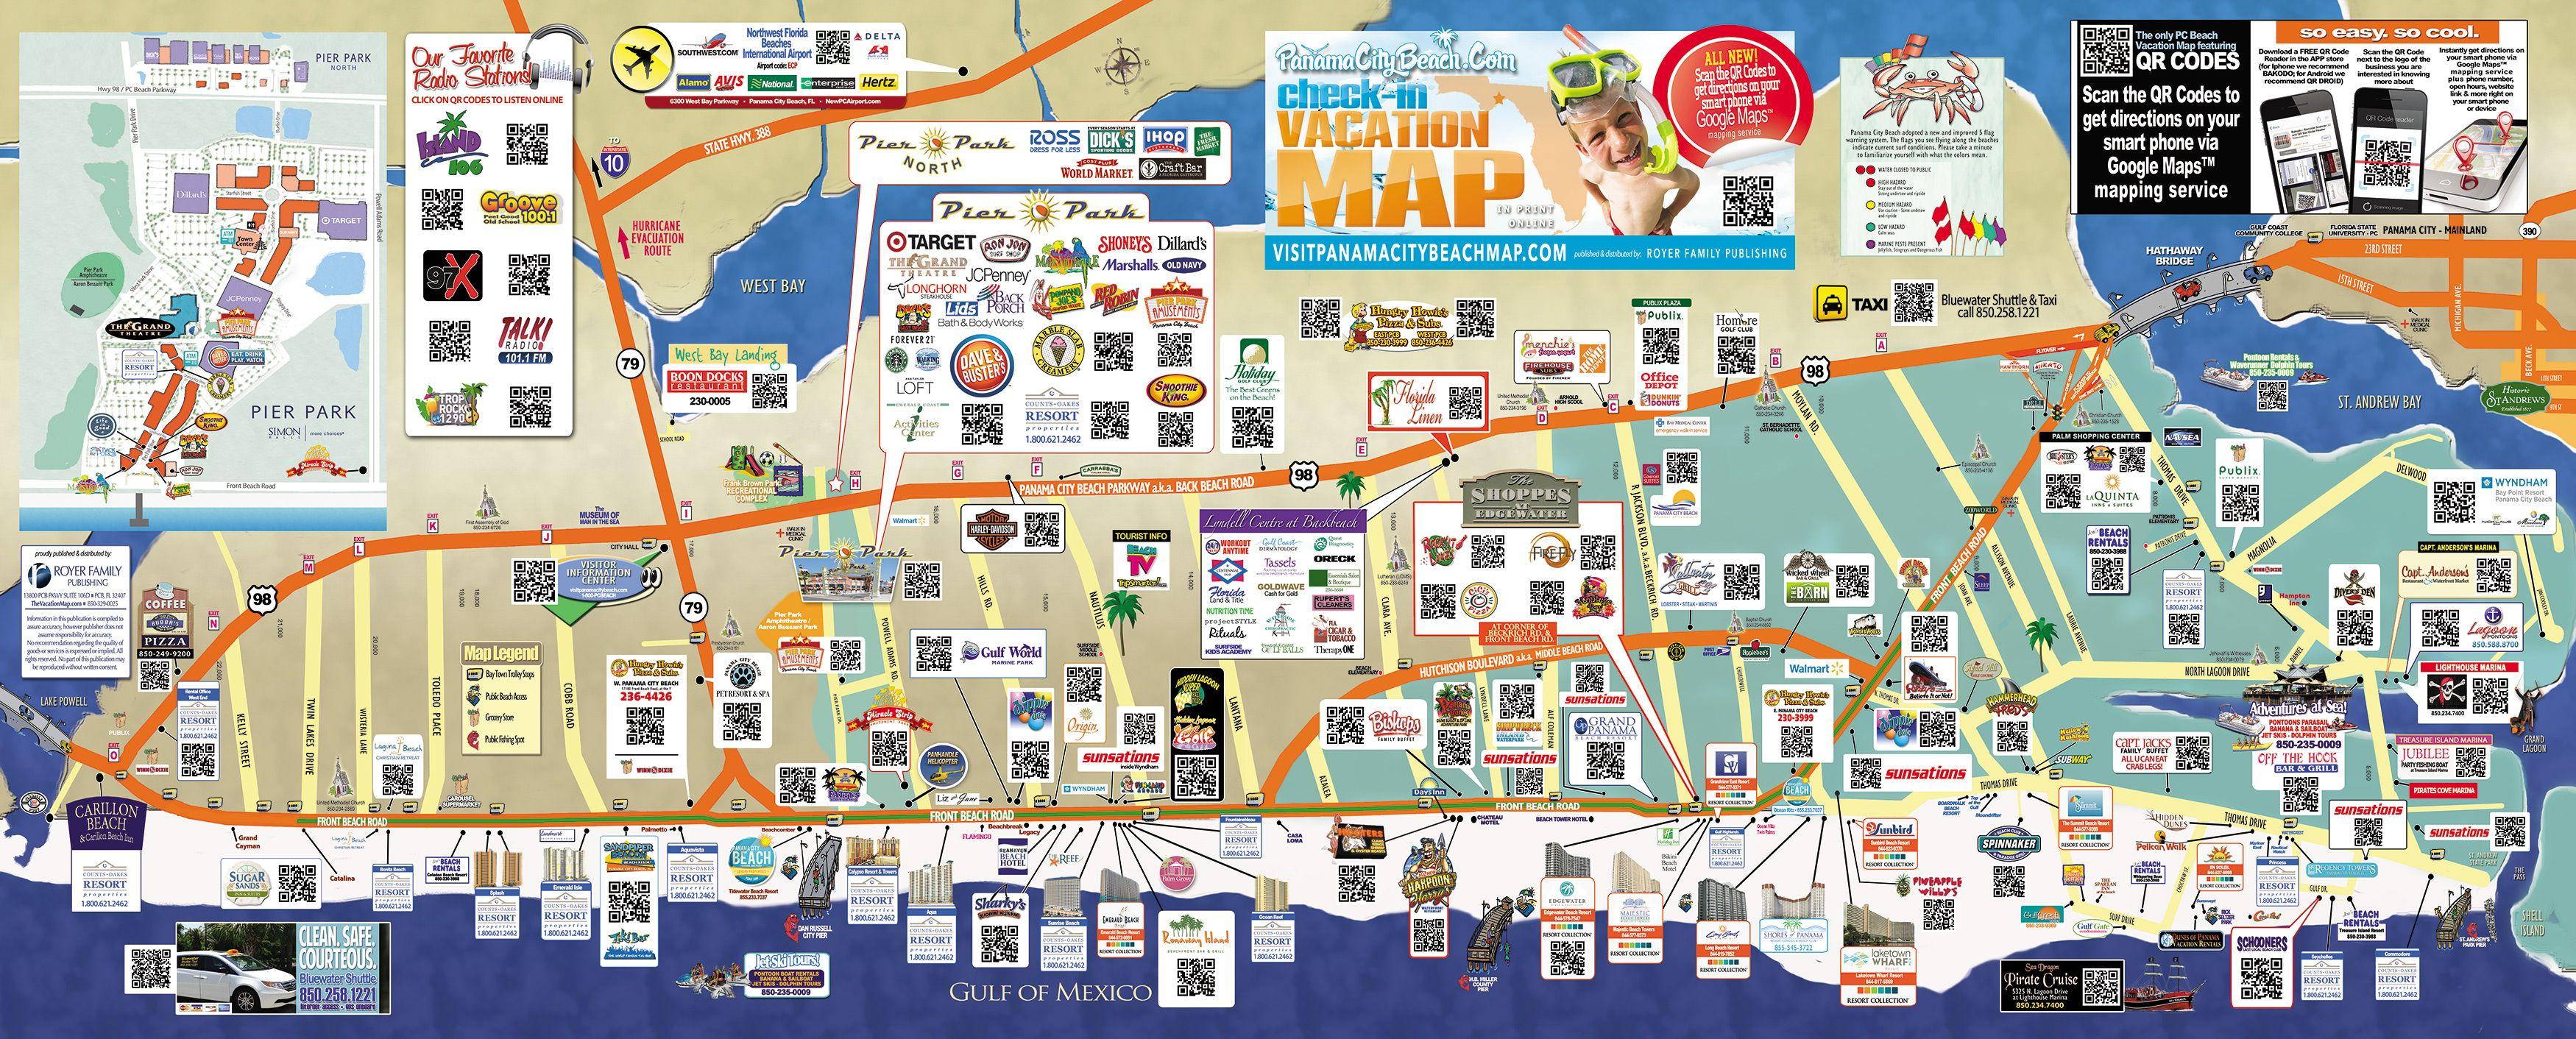 Tourist Map Of Panama City Beach   To The Beach!   Pinterest - Map Of Panama City Beach Florida